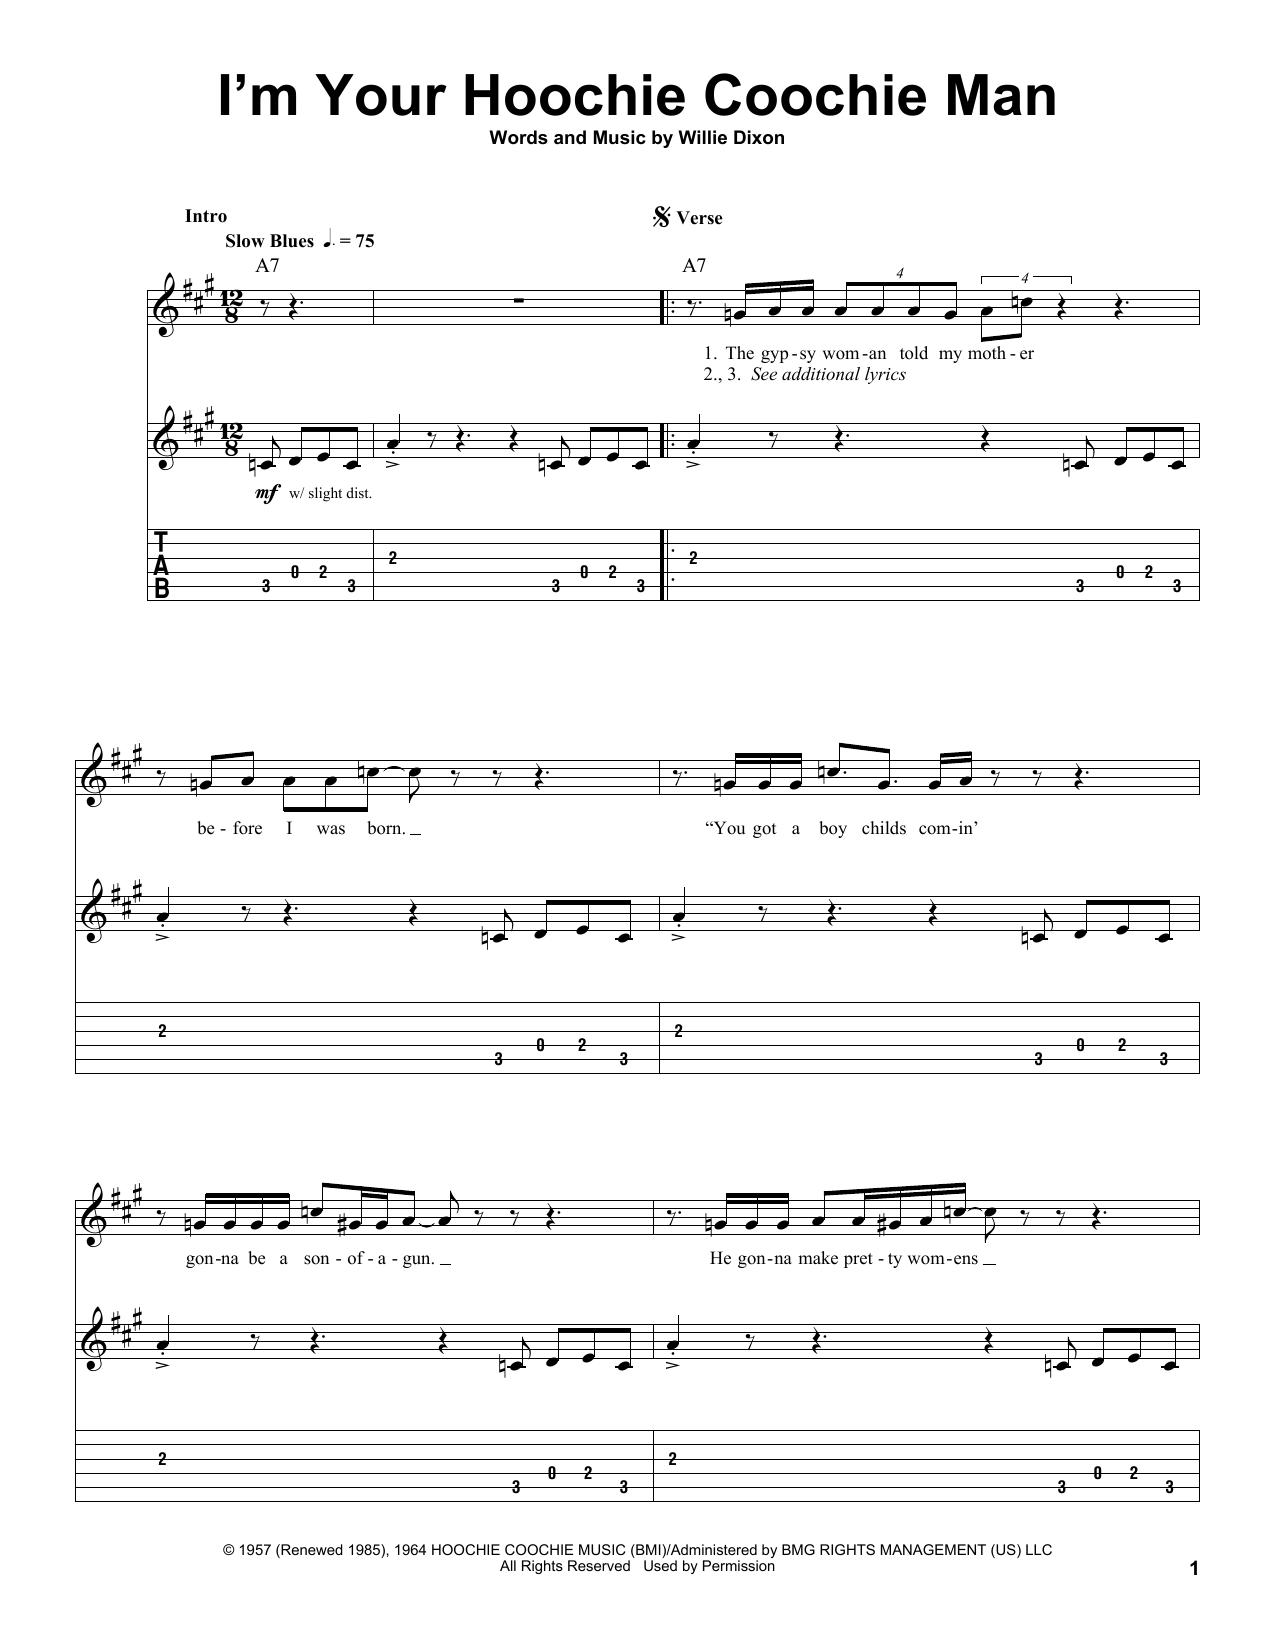 I'm Your Hoochie Coochie Man sheet music